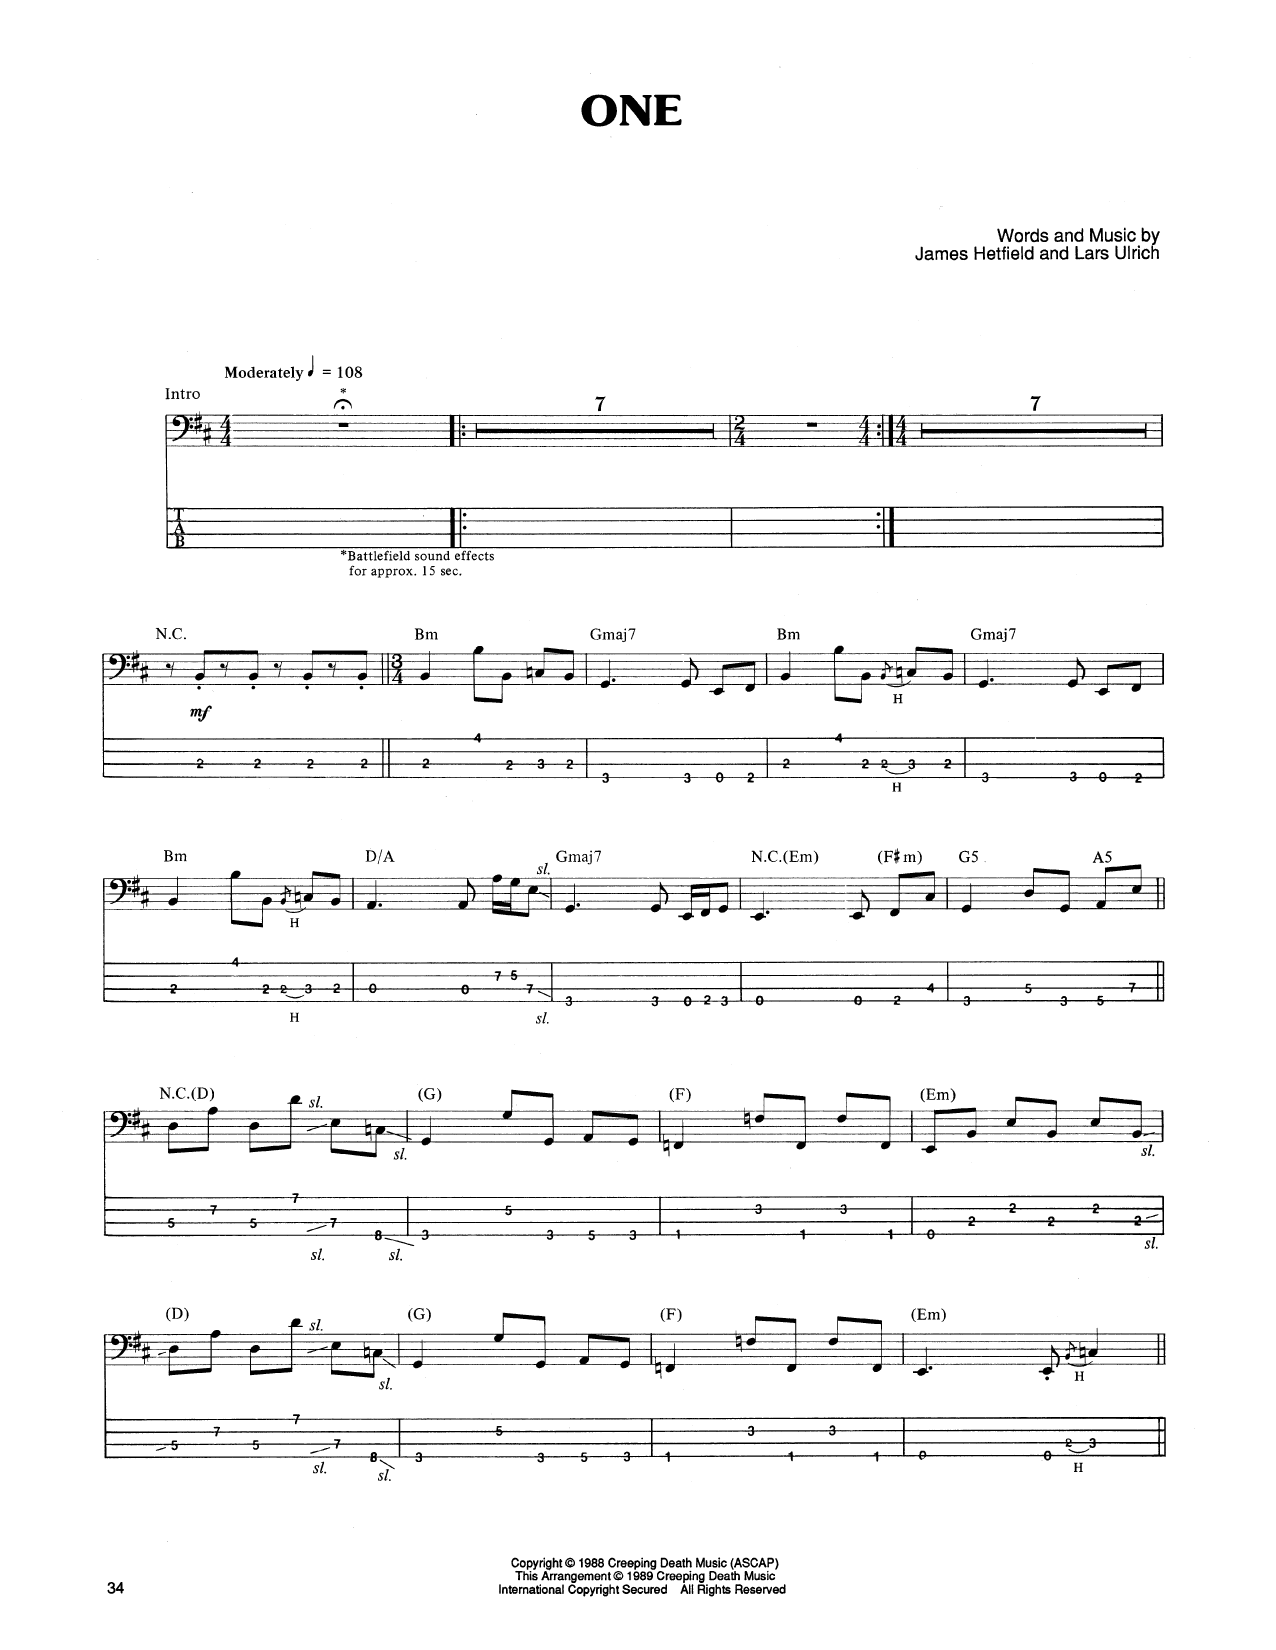 Tablature guitare One de Metallica - Tablature Basse